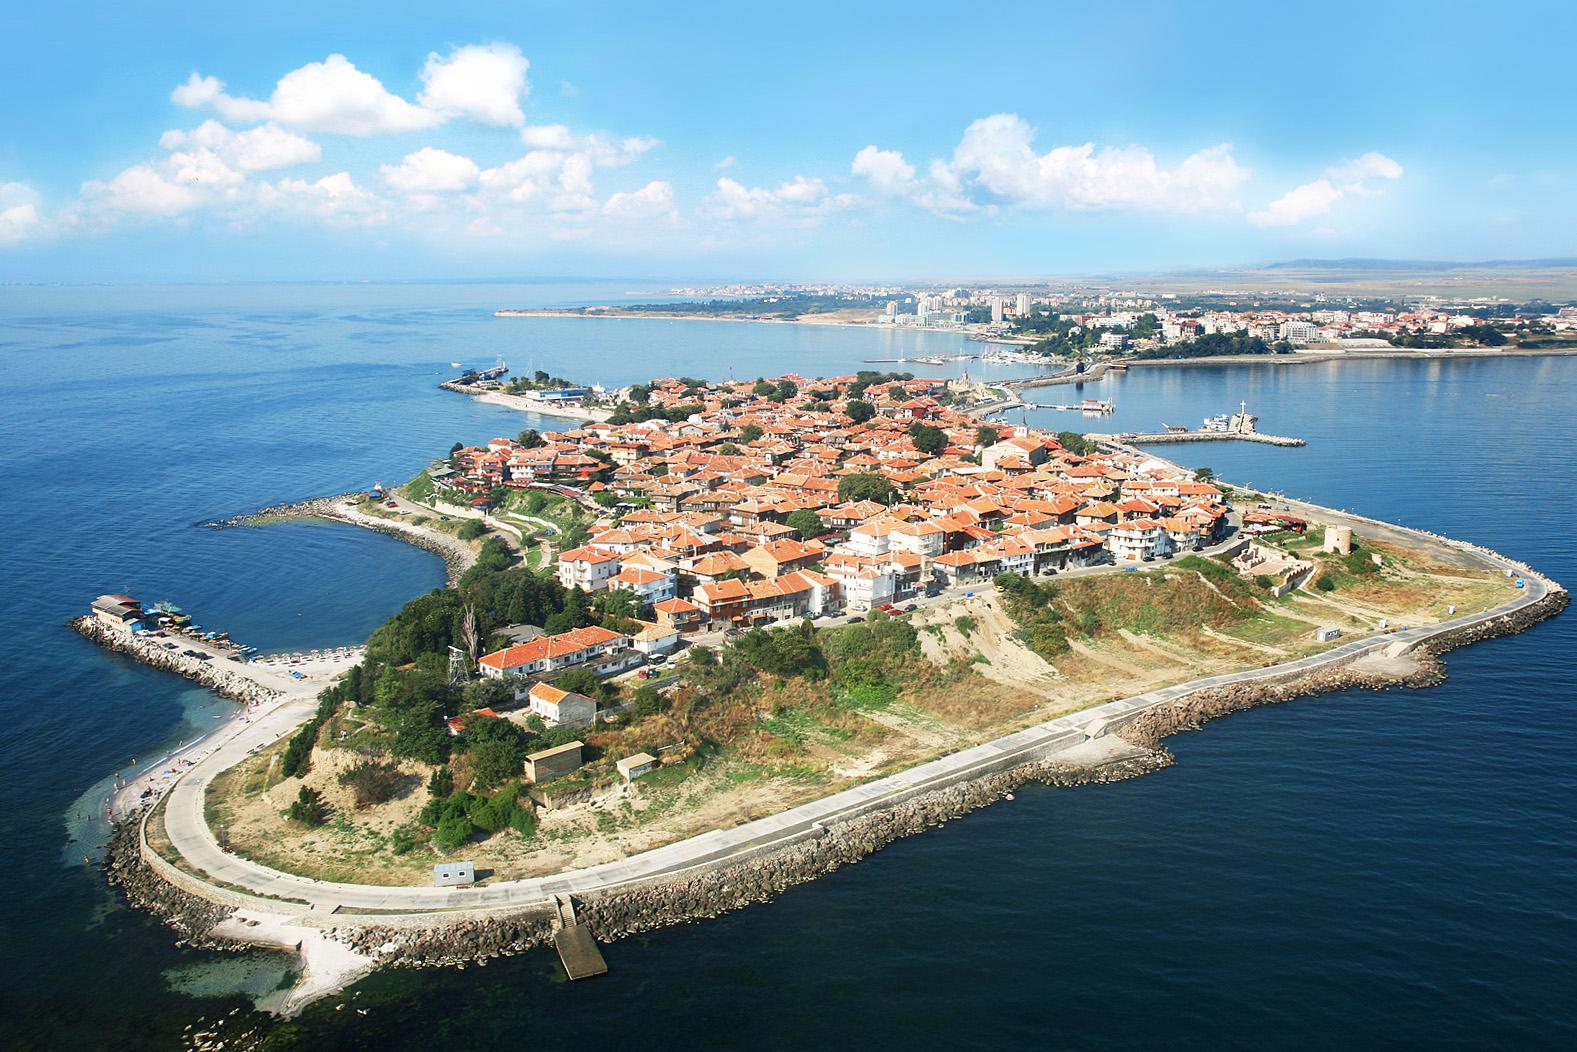 Место отдыха в Болгарии - Несебр